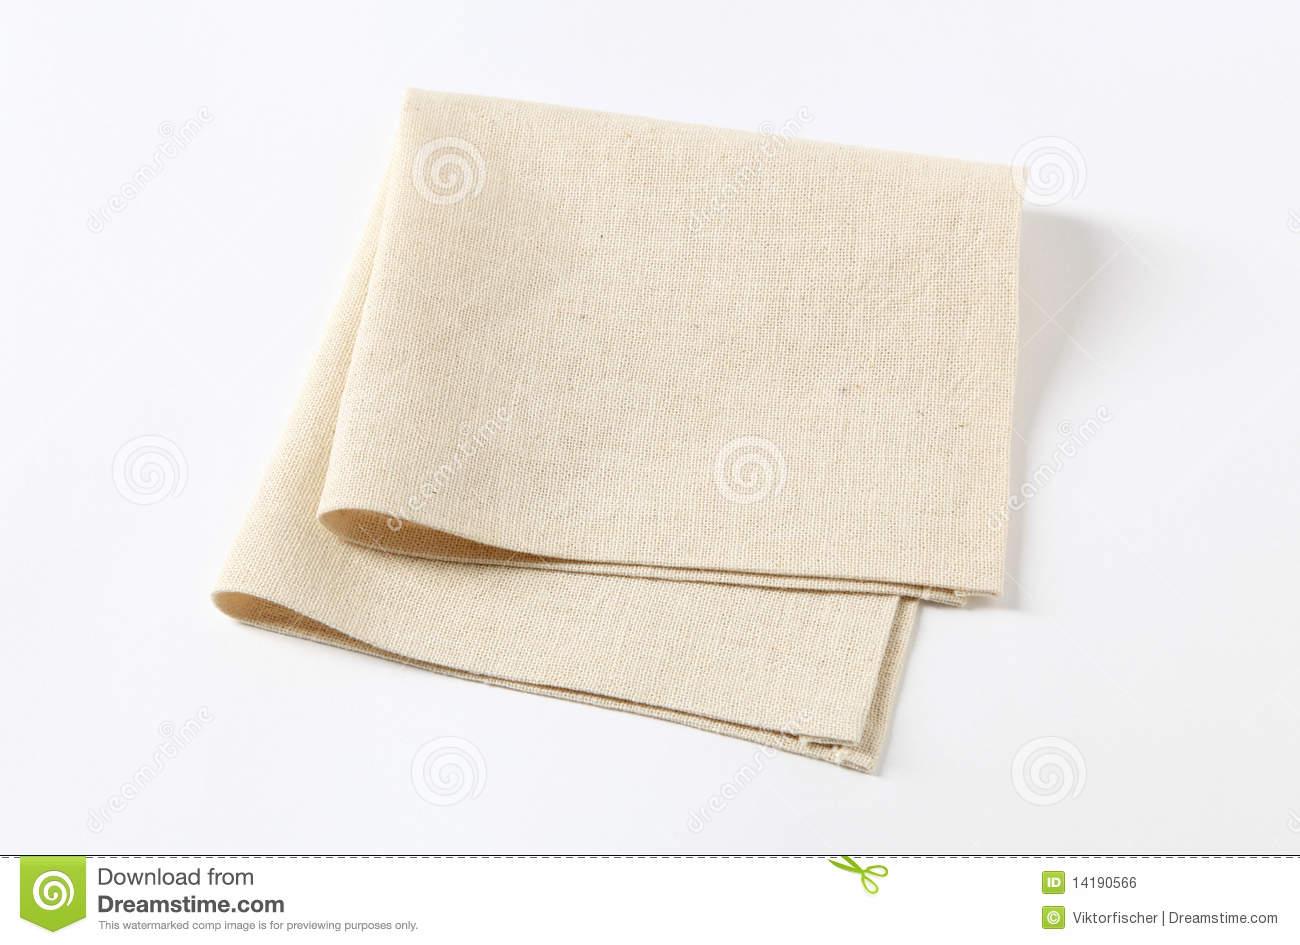 Napkin Clipart - Clipart Suggest